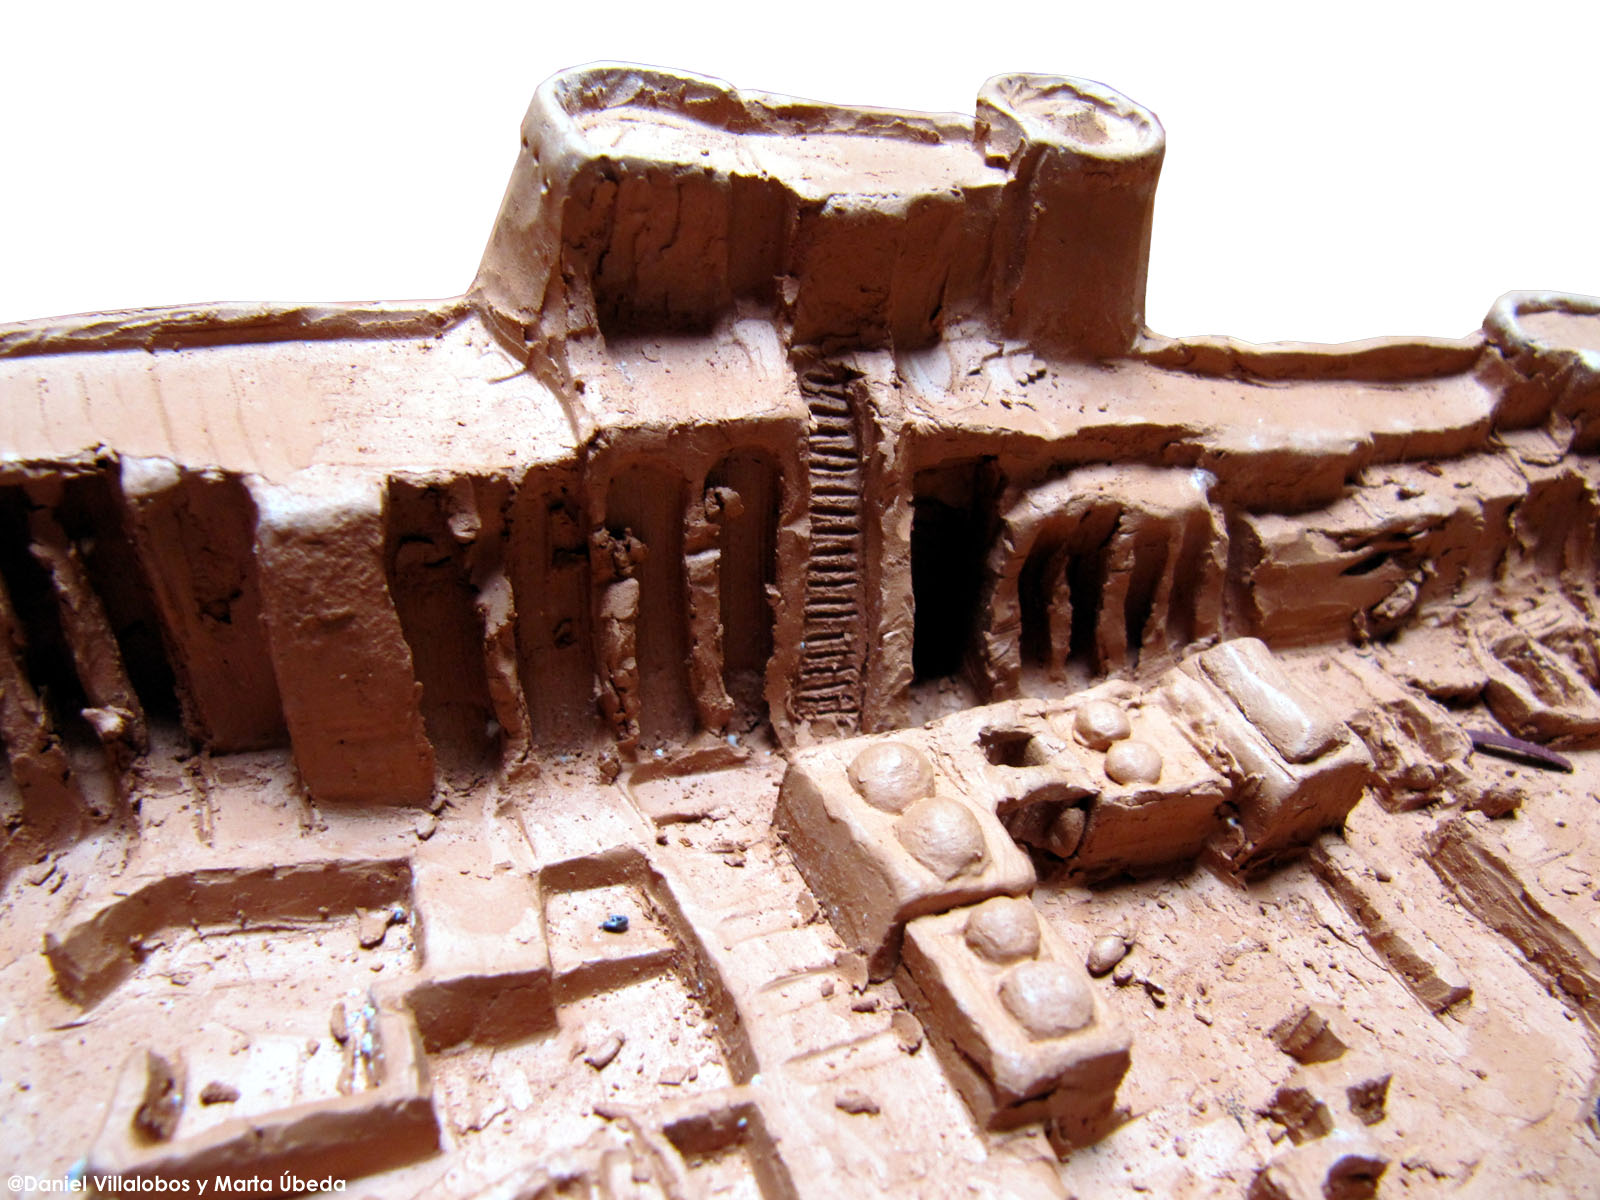 danielvillalobos-architecturalexhibition-bam-architectureofmud-55